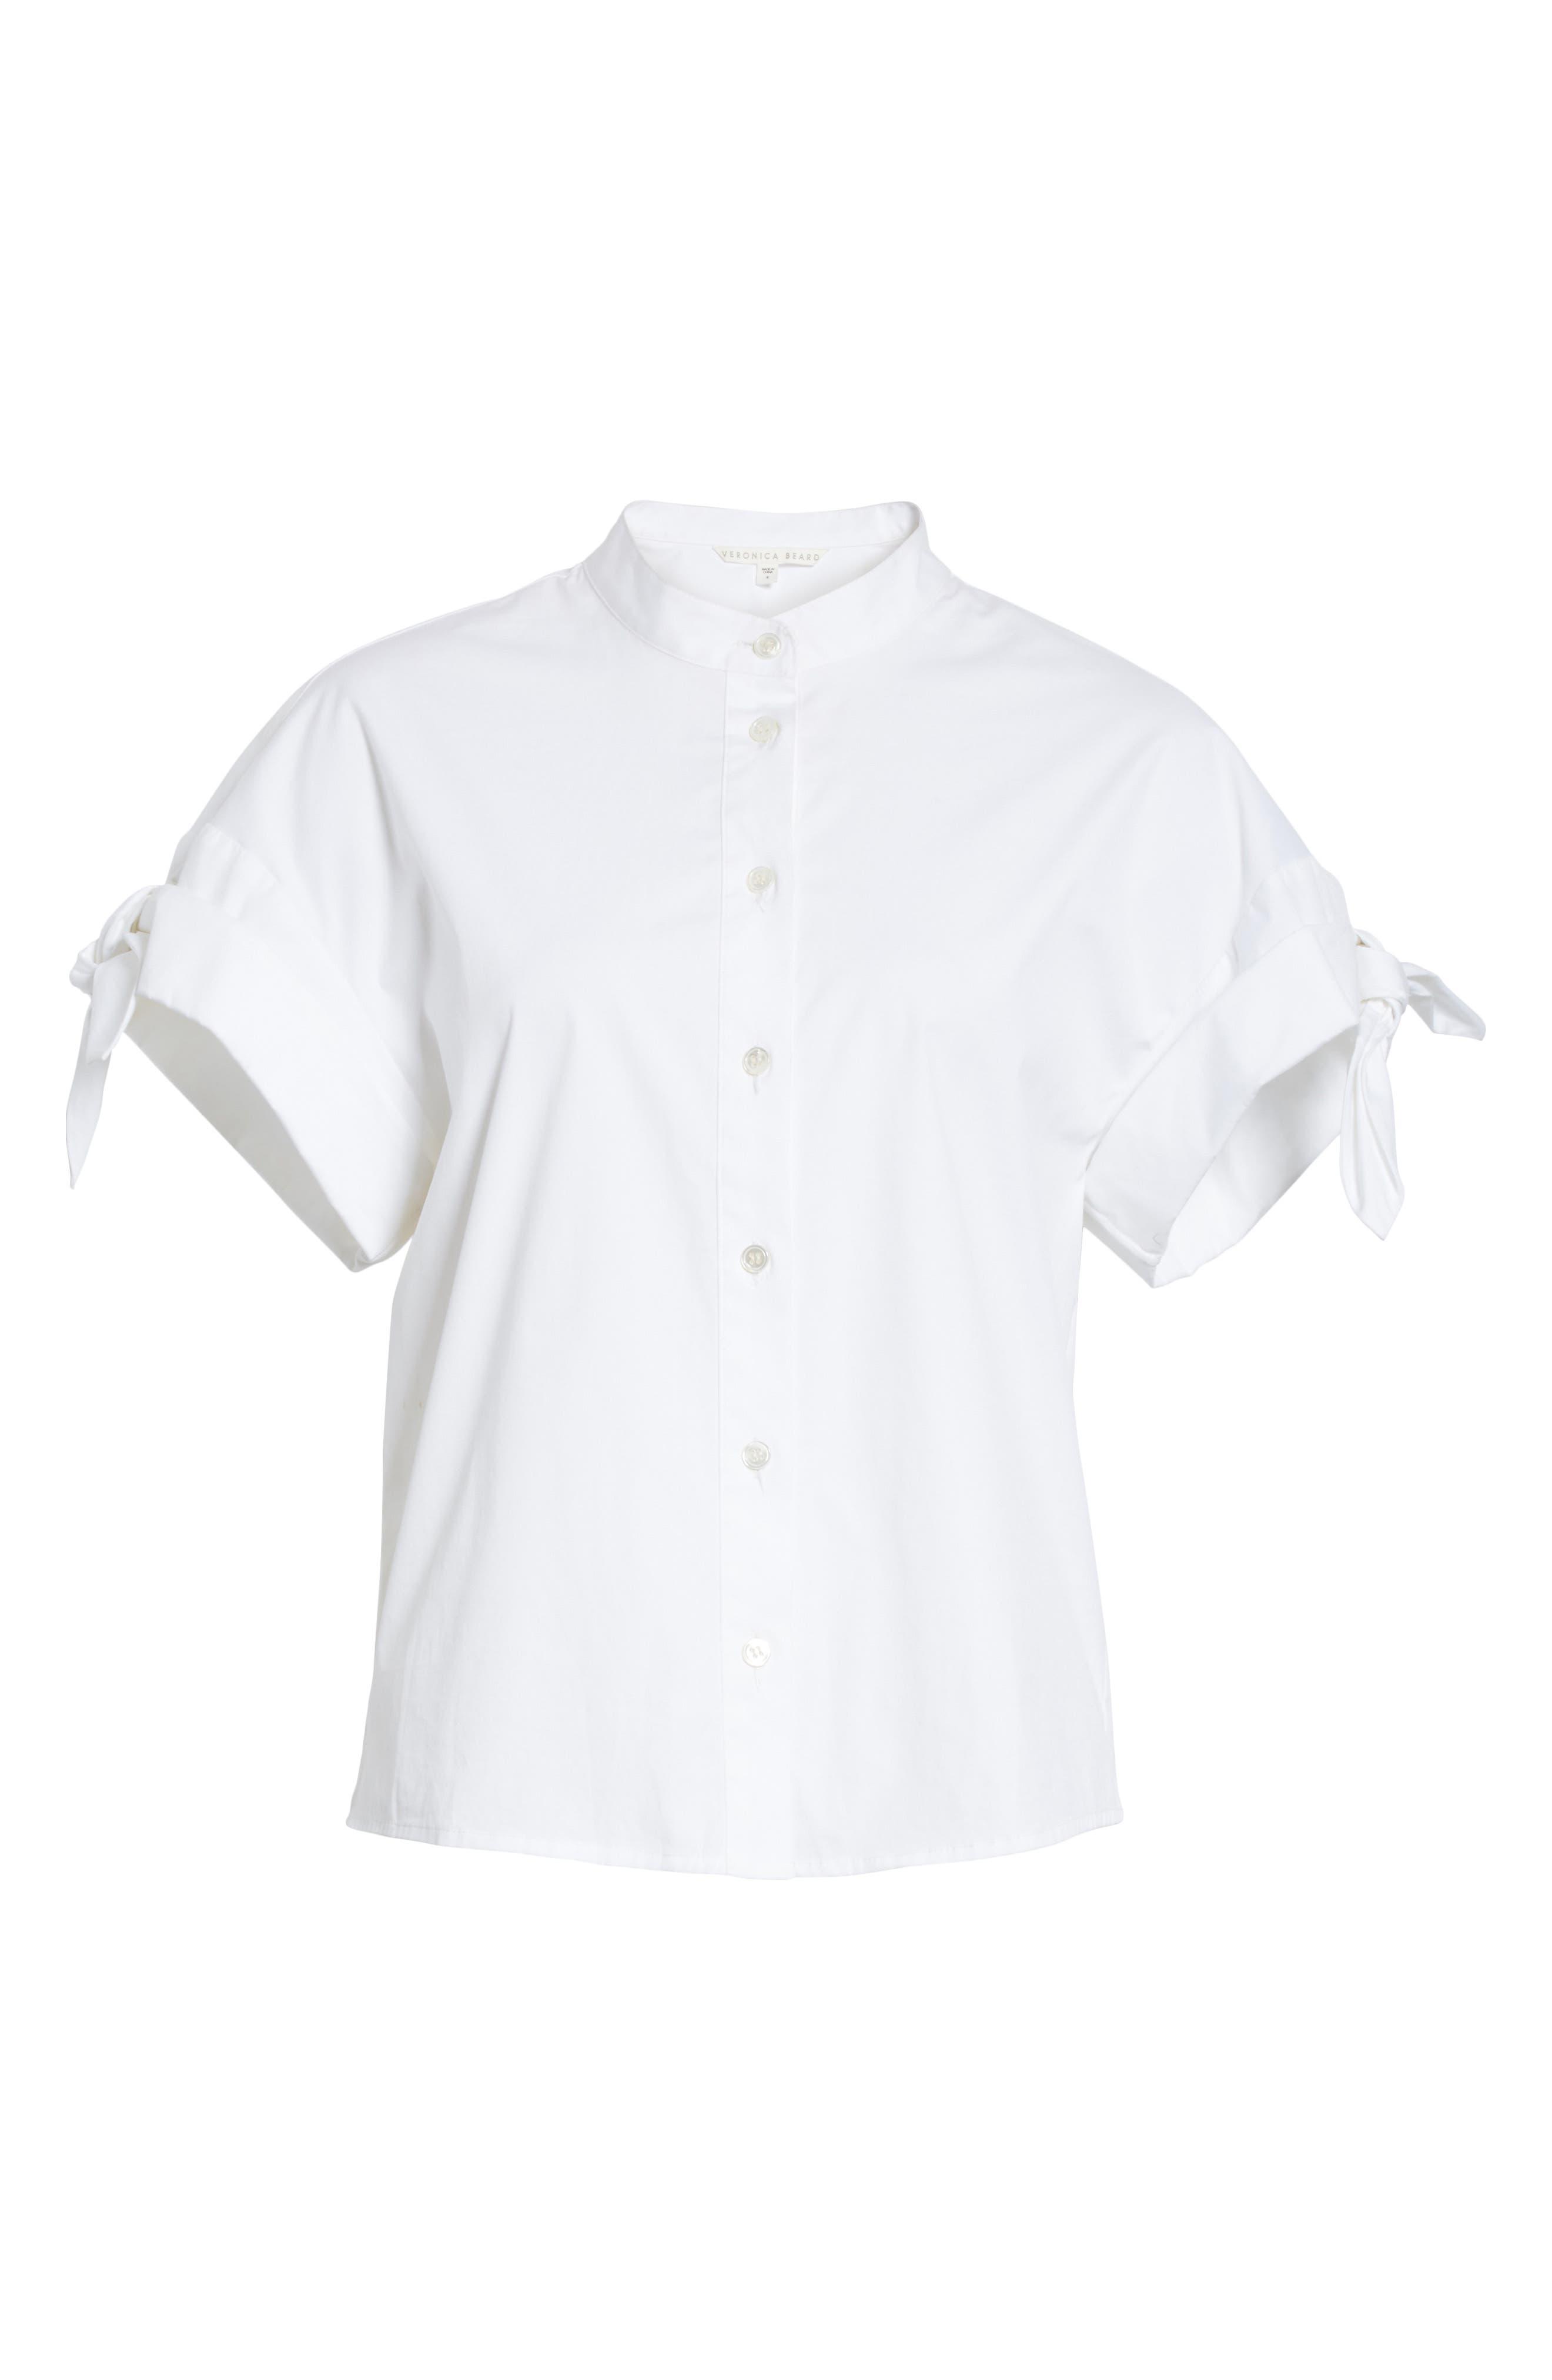 Sanaa Stretch Cotton Shirt,                             Alternate thumbnail 6, color,                             100